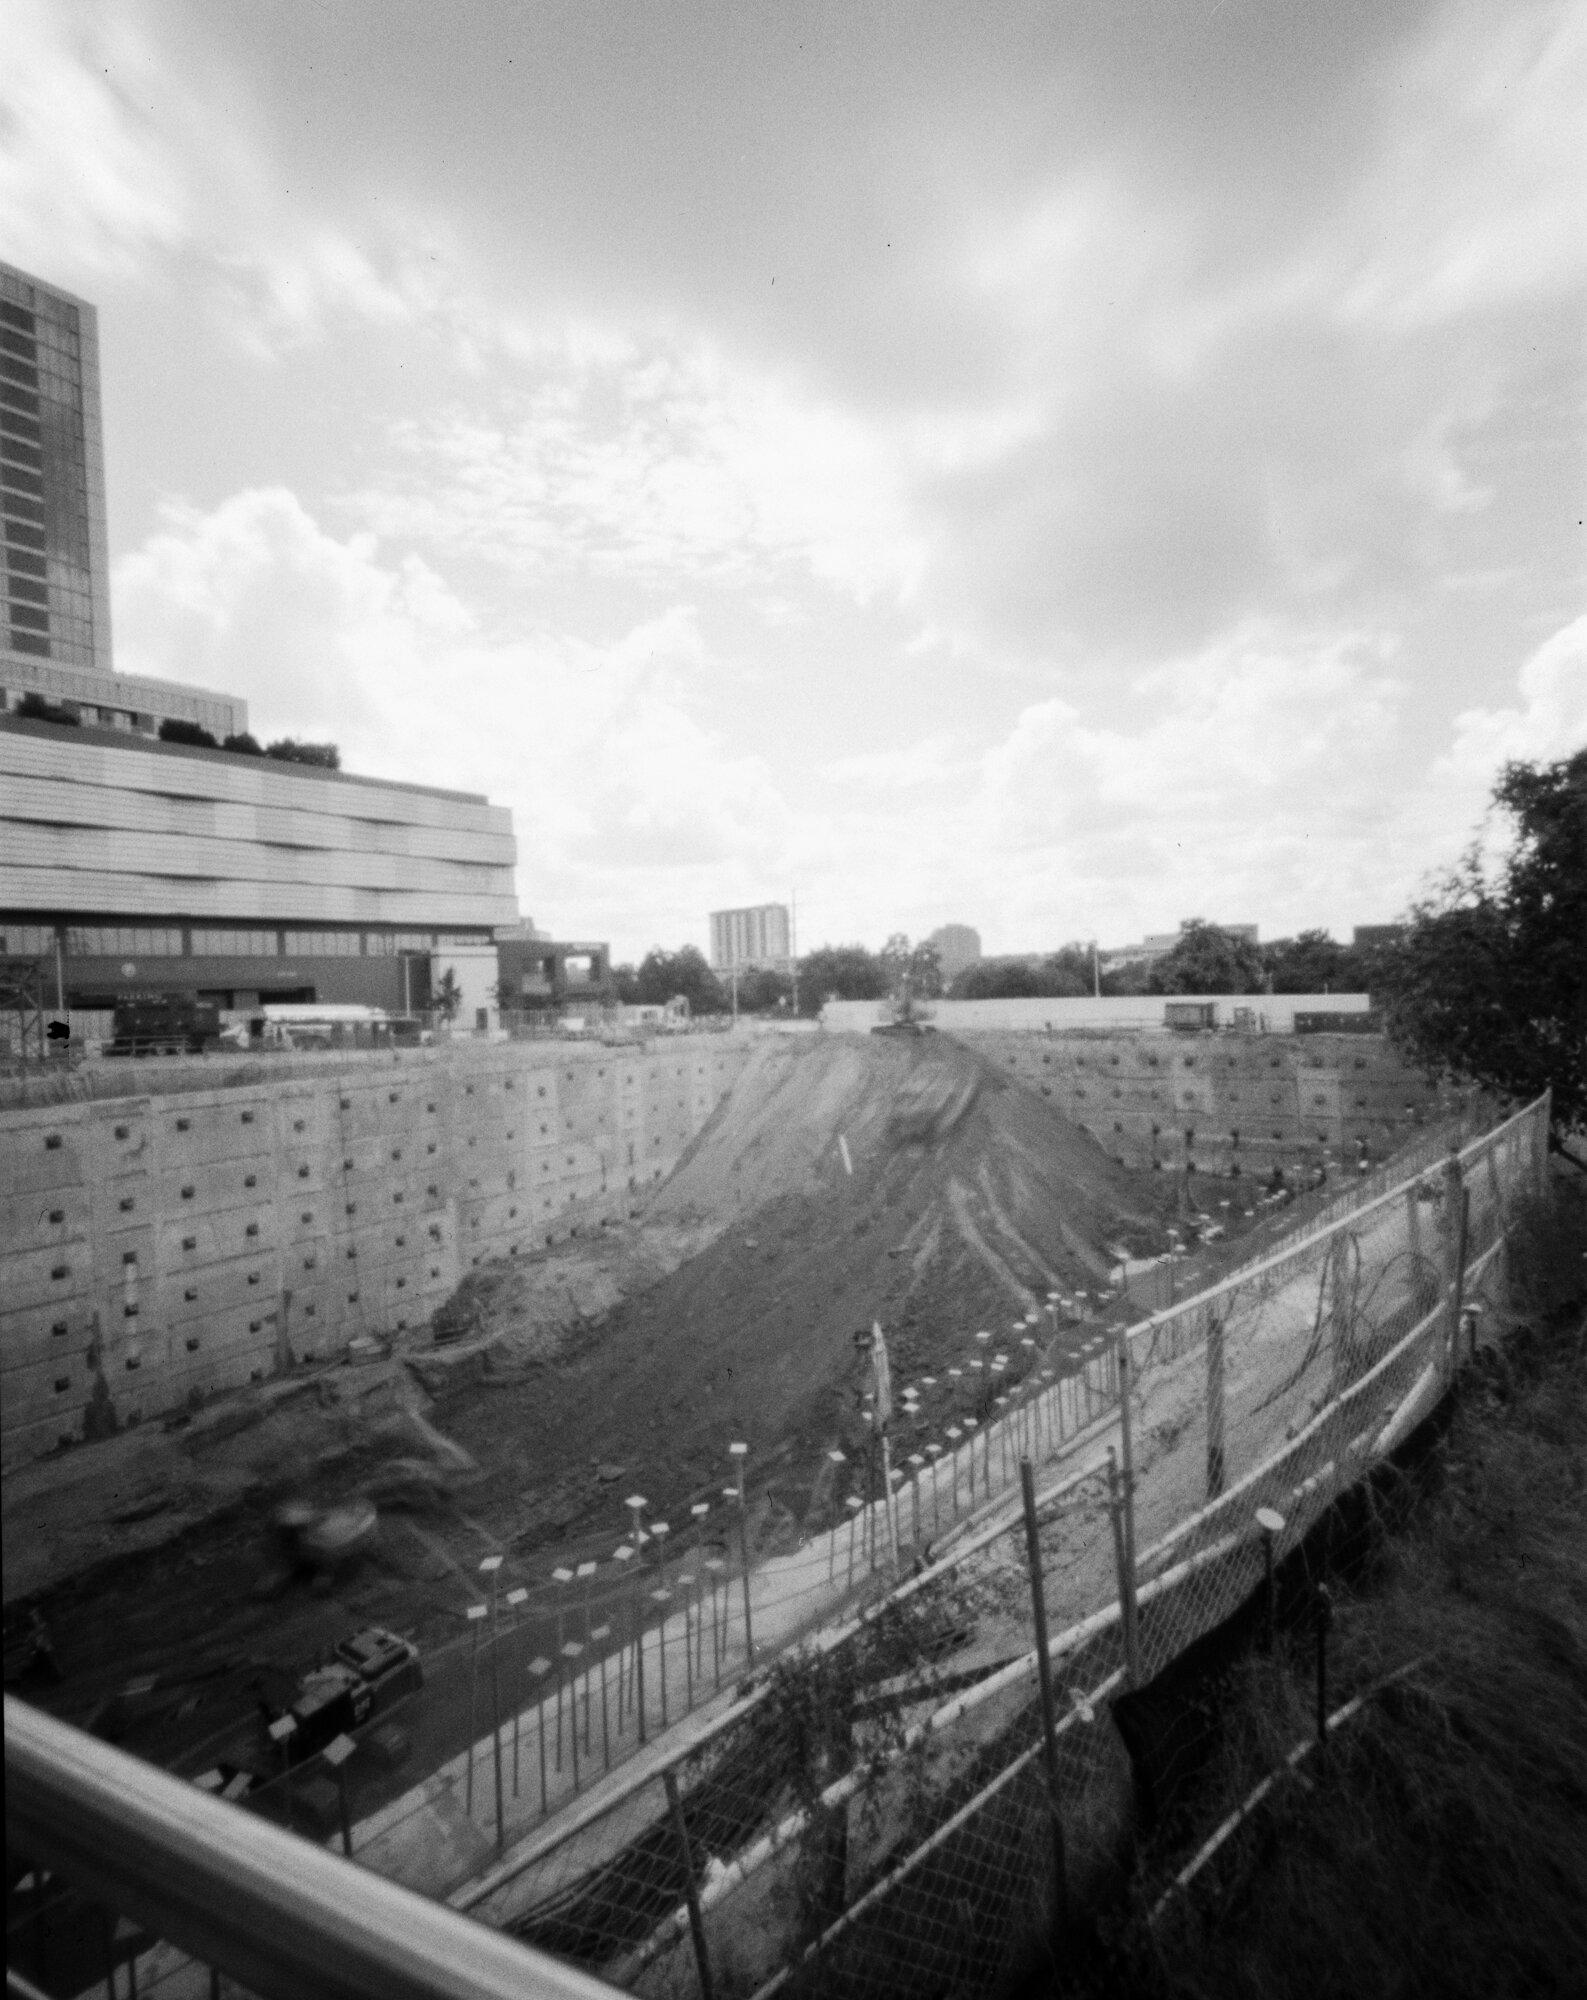 ondu 4x5 rise downtown austin sept 2019 (8 of 12).jpg